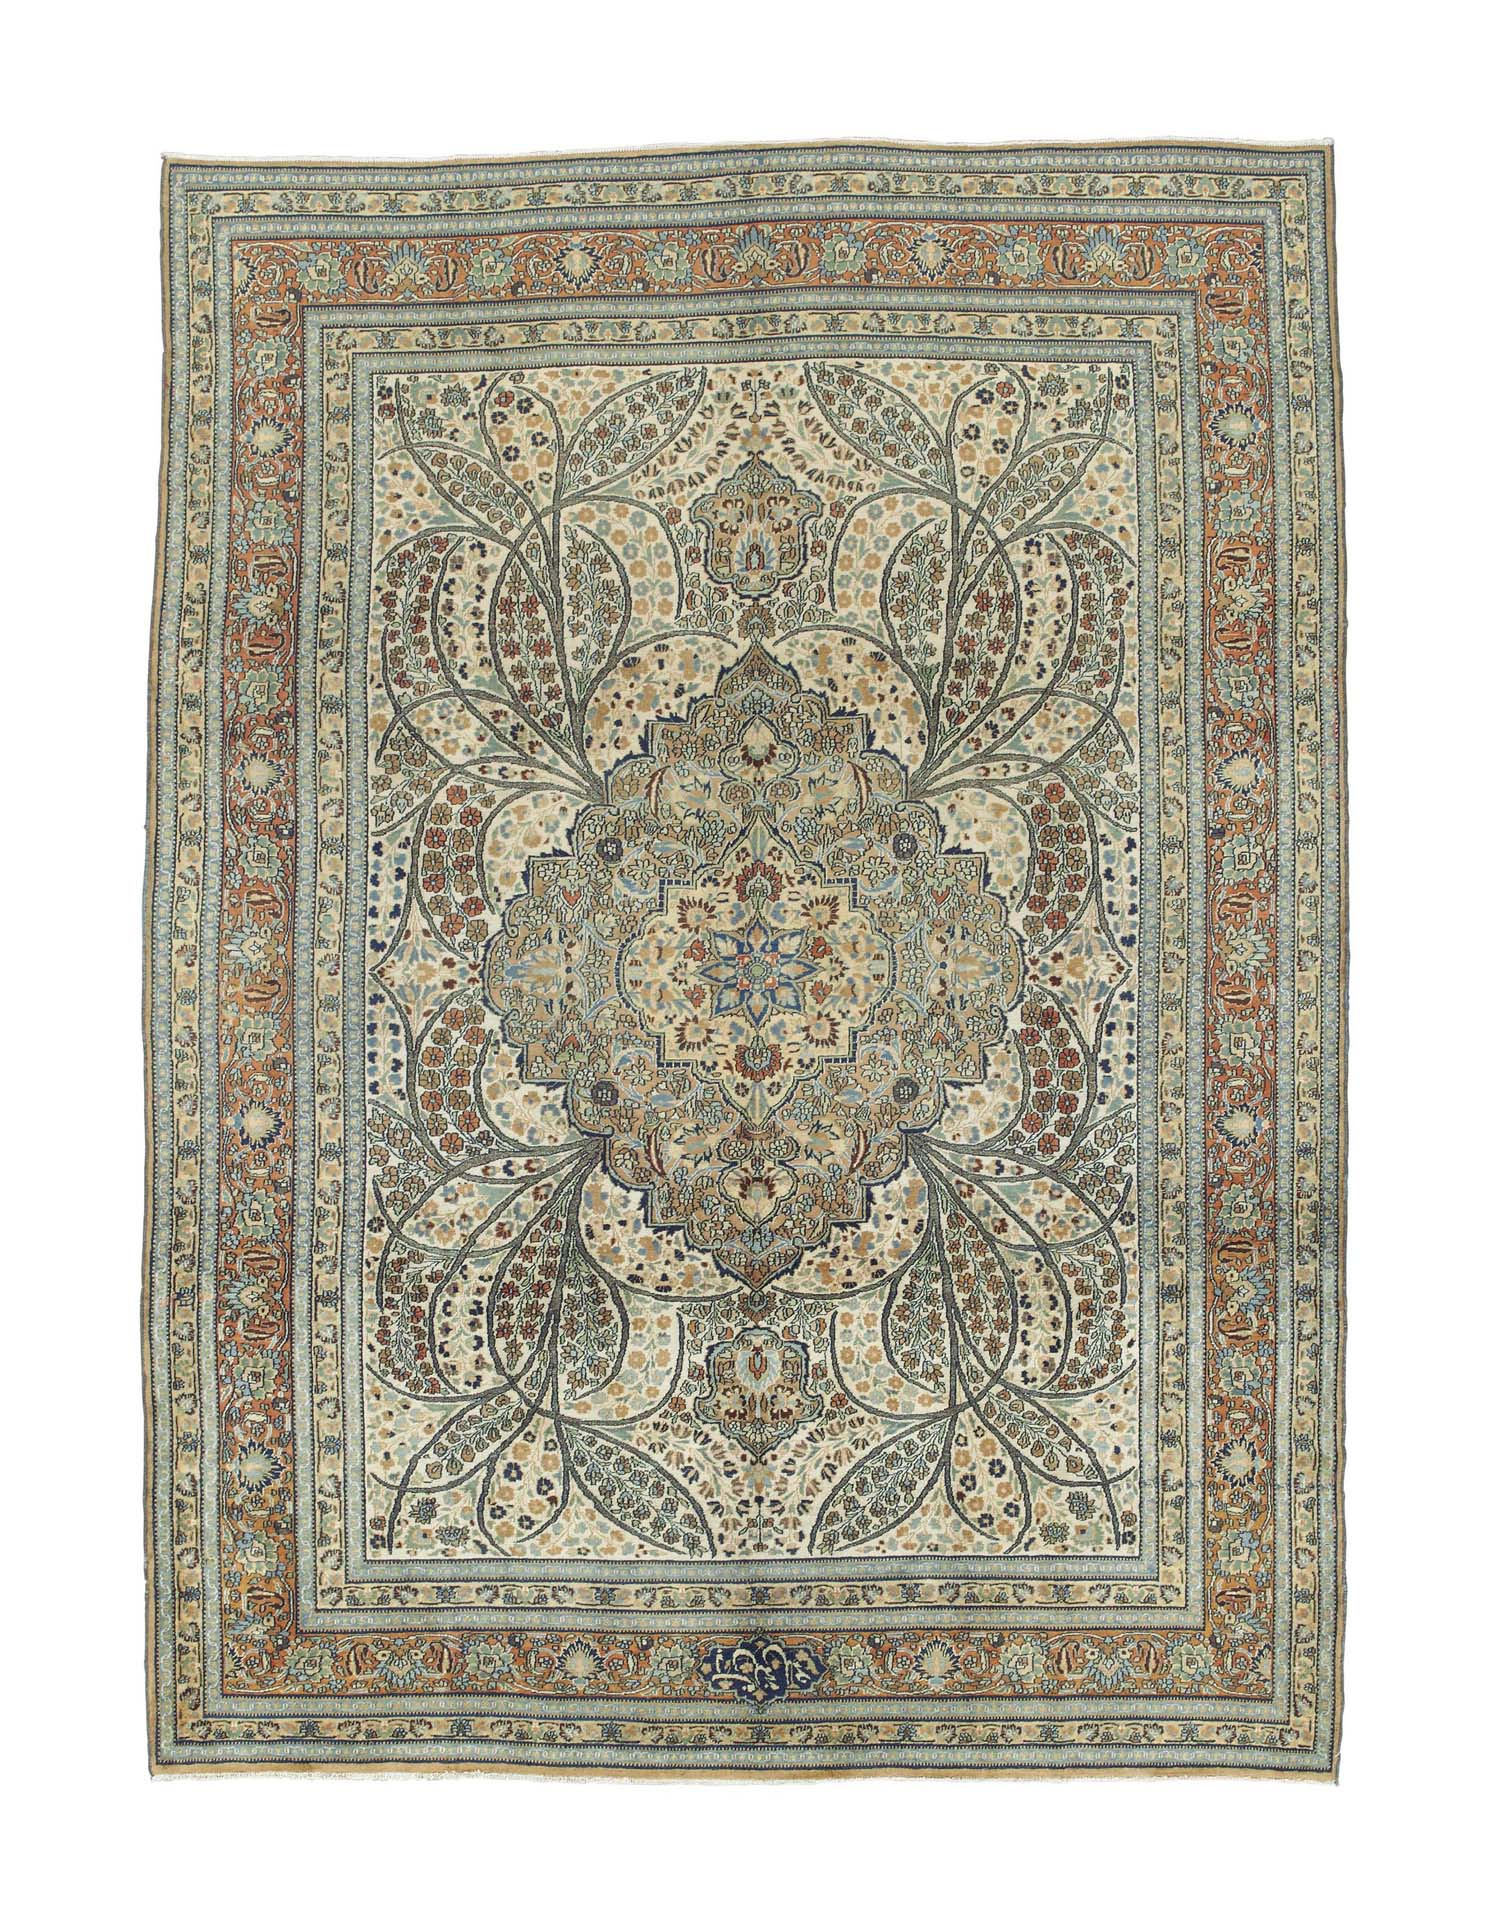 A fine Doroksh carpet